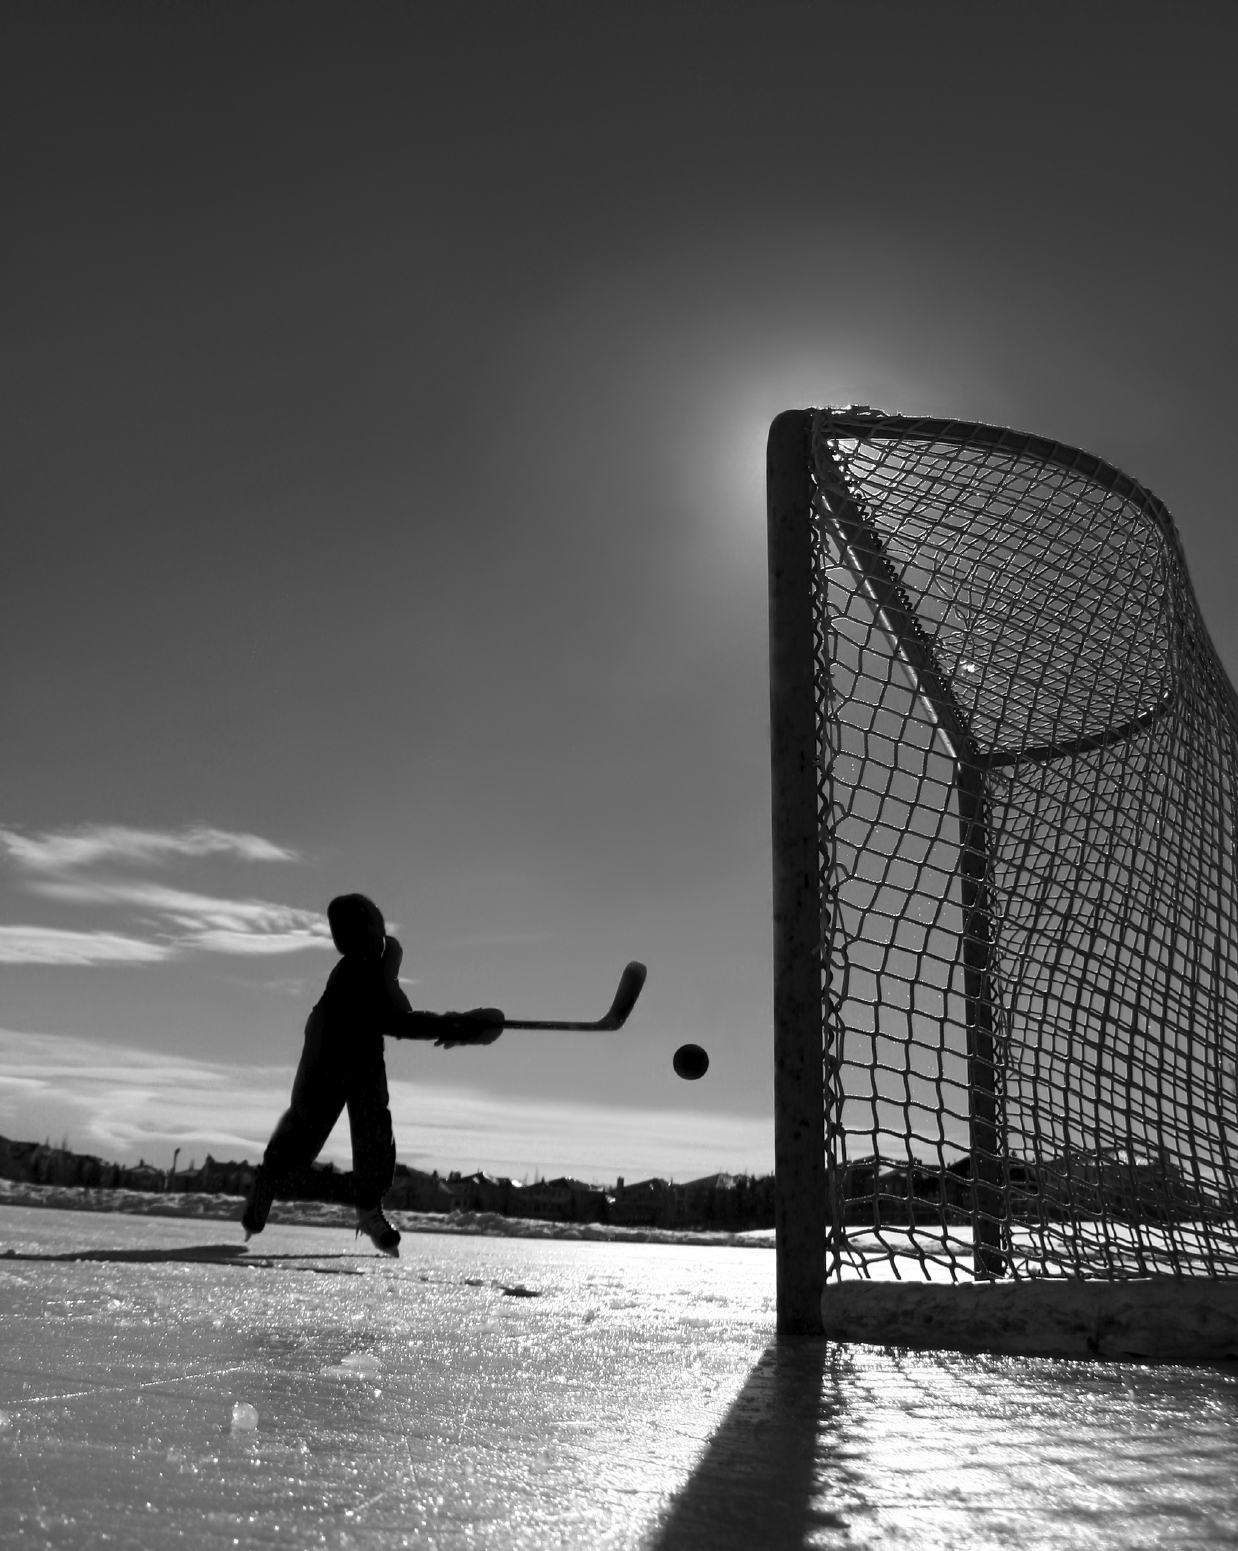 Somewhere in hockey land....